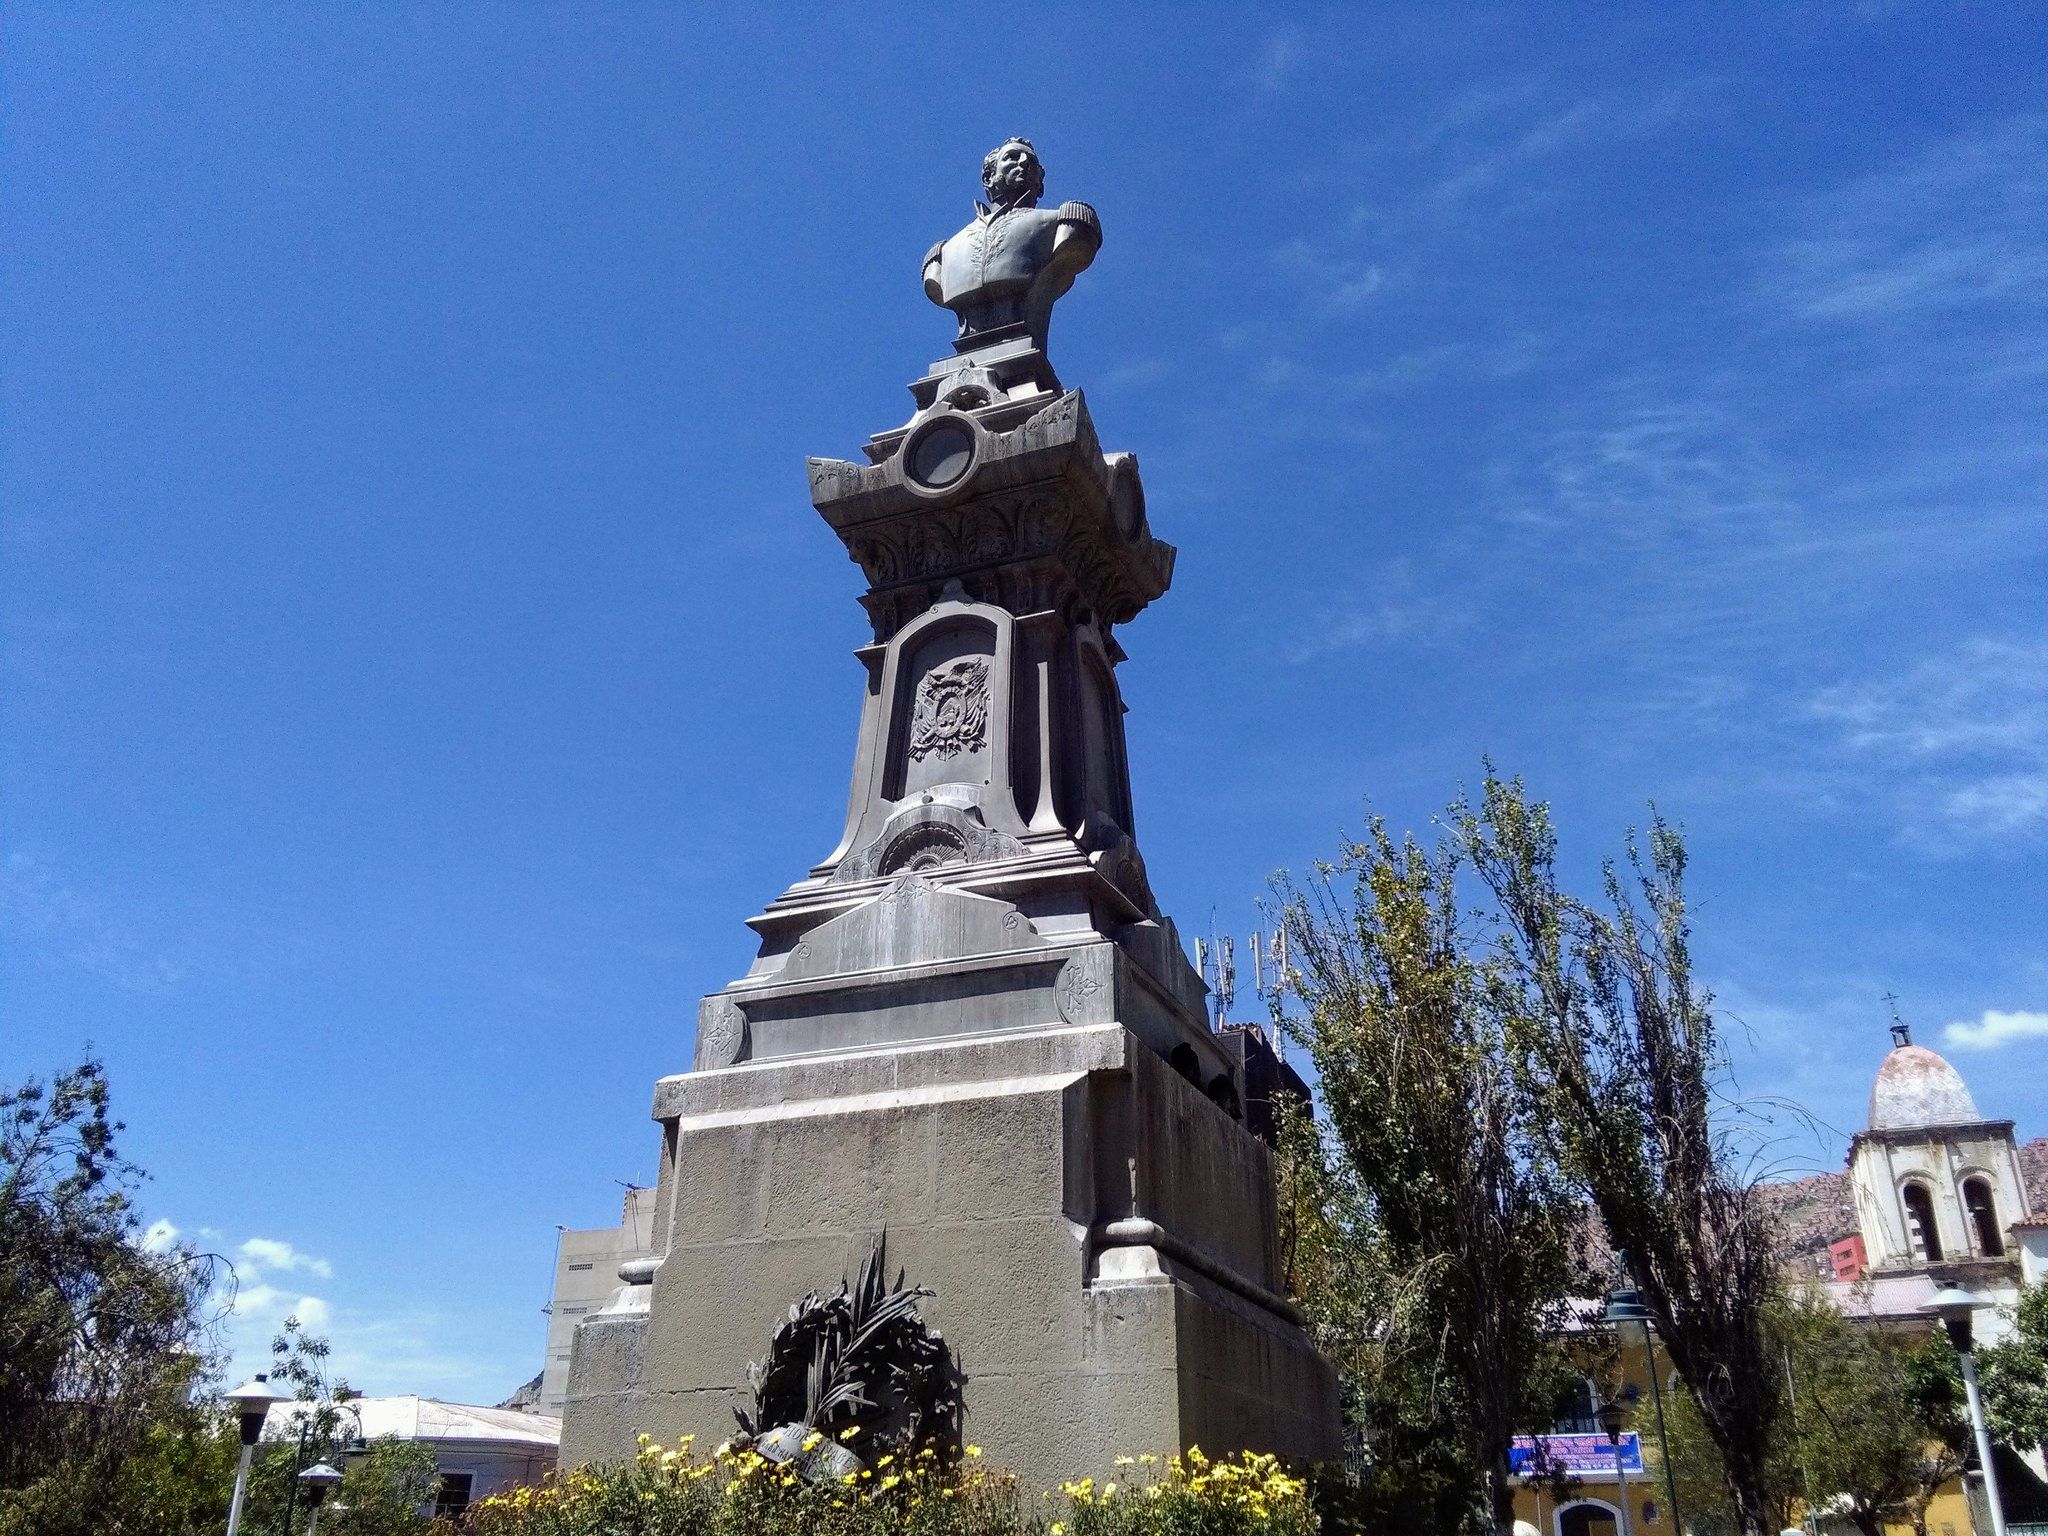 Plaza de San Pedro in La Paz